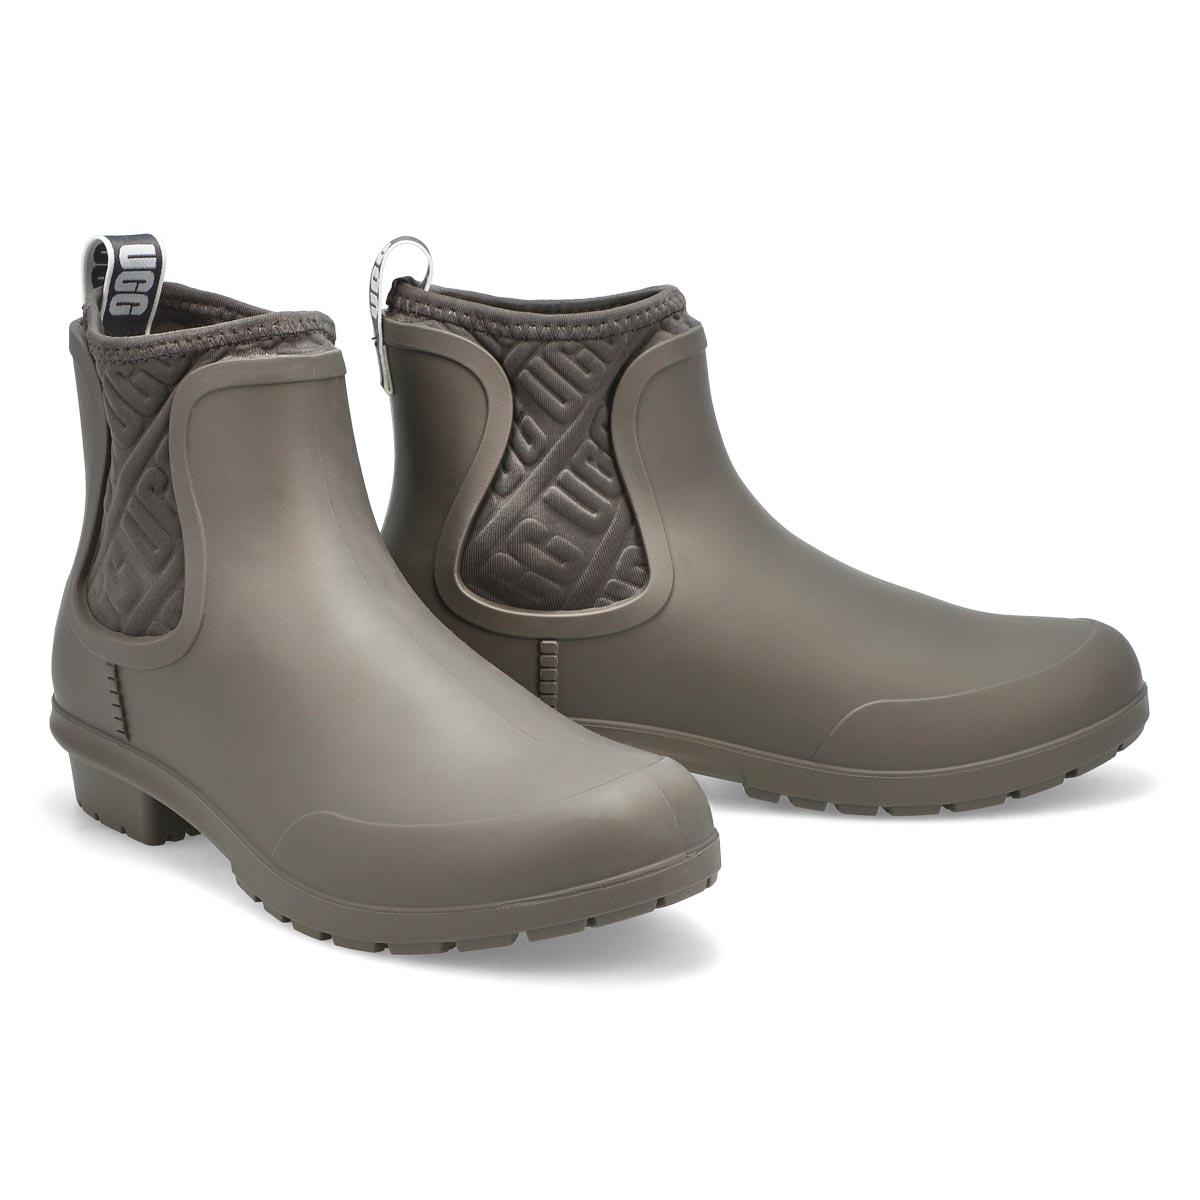 Women's Chevonne Chelsea Rain Boot - Charcoal